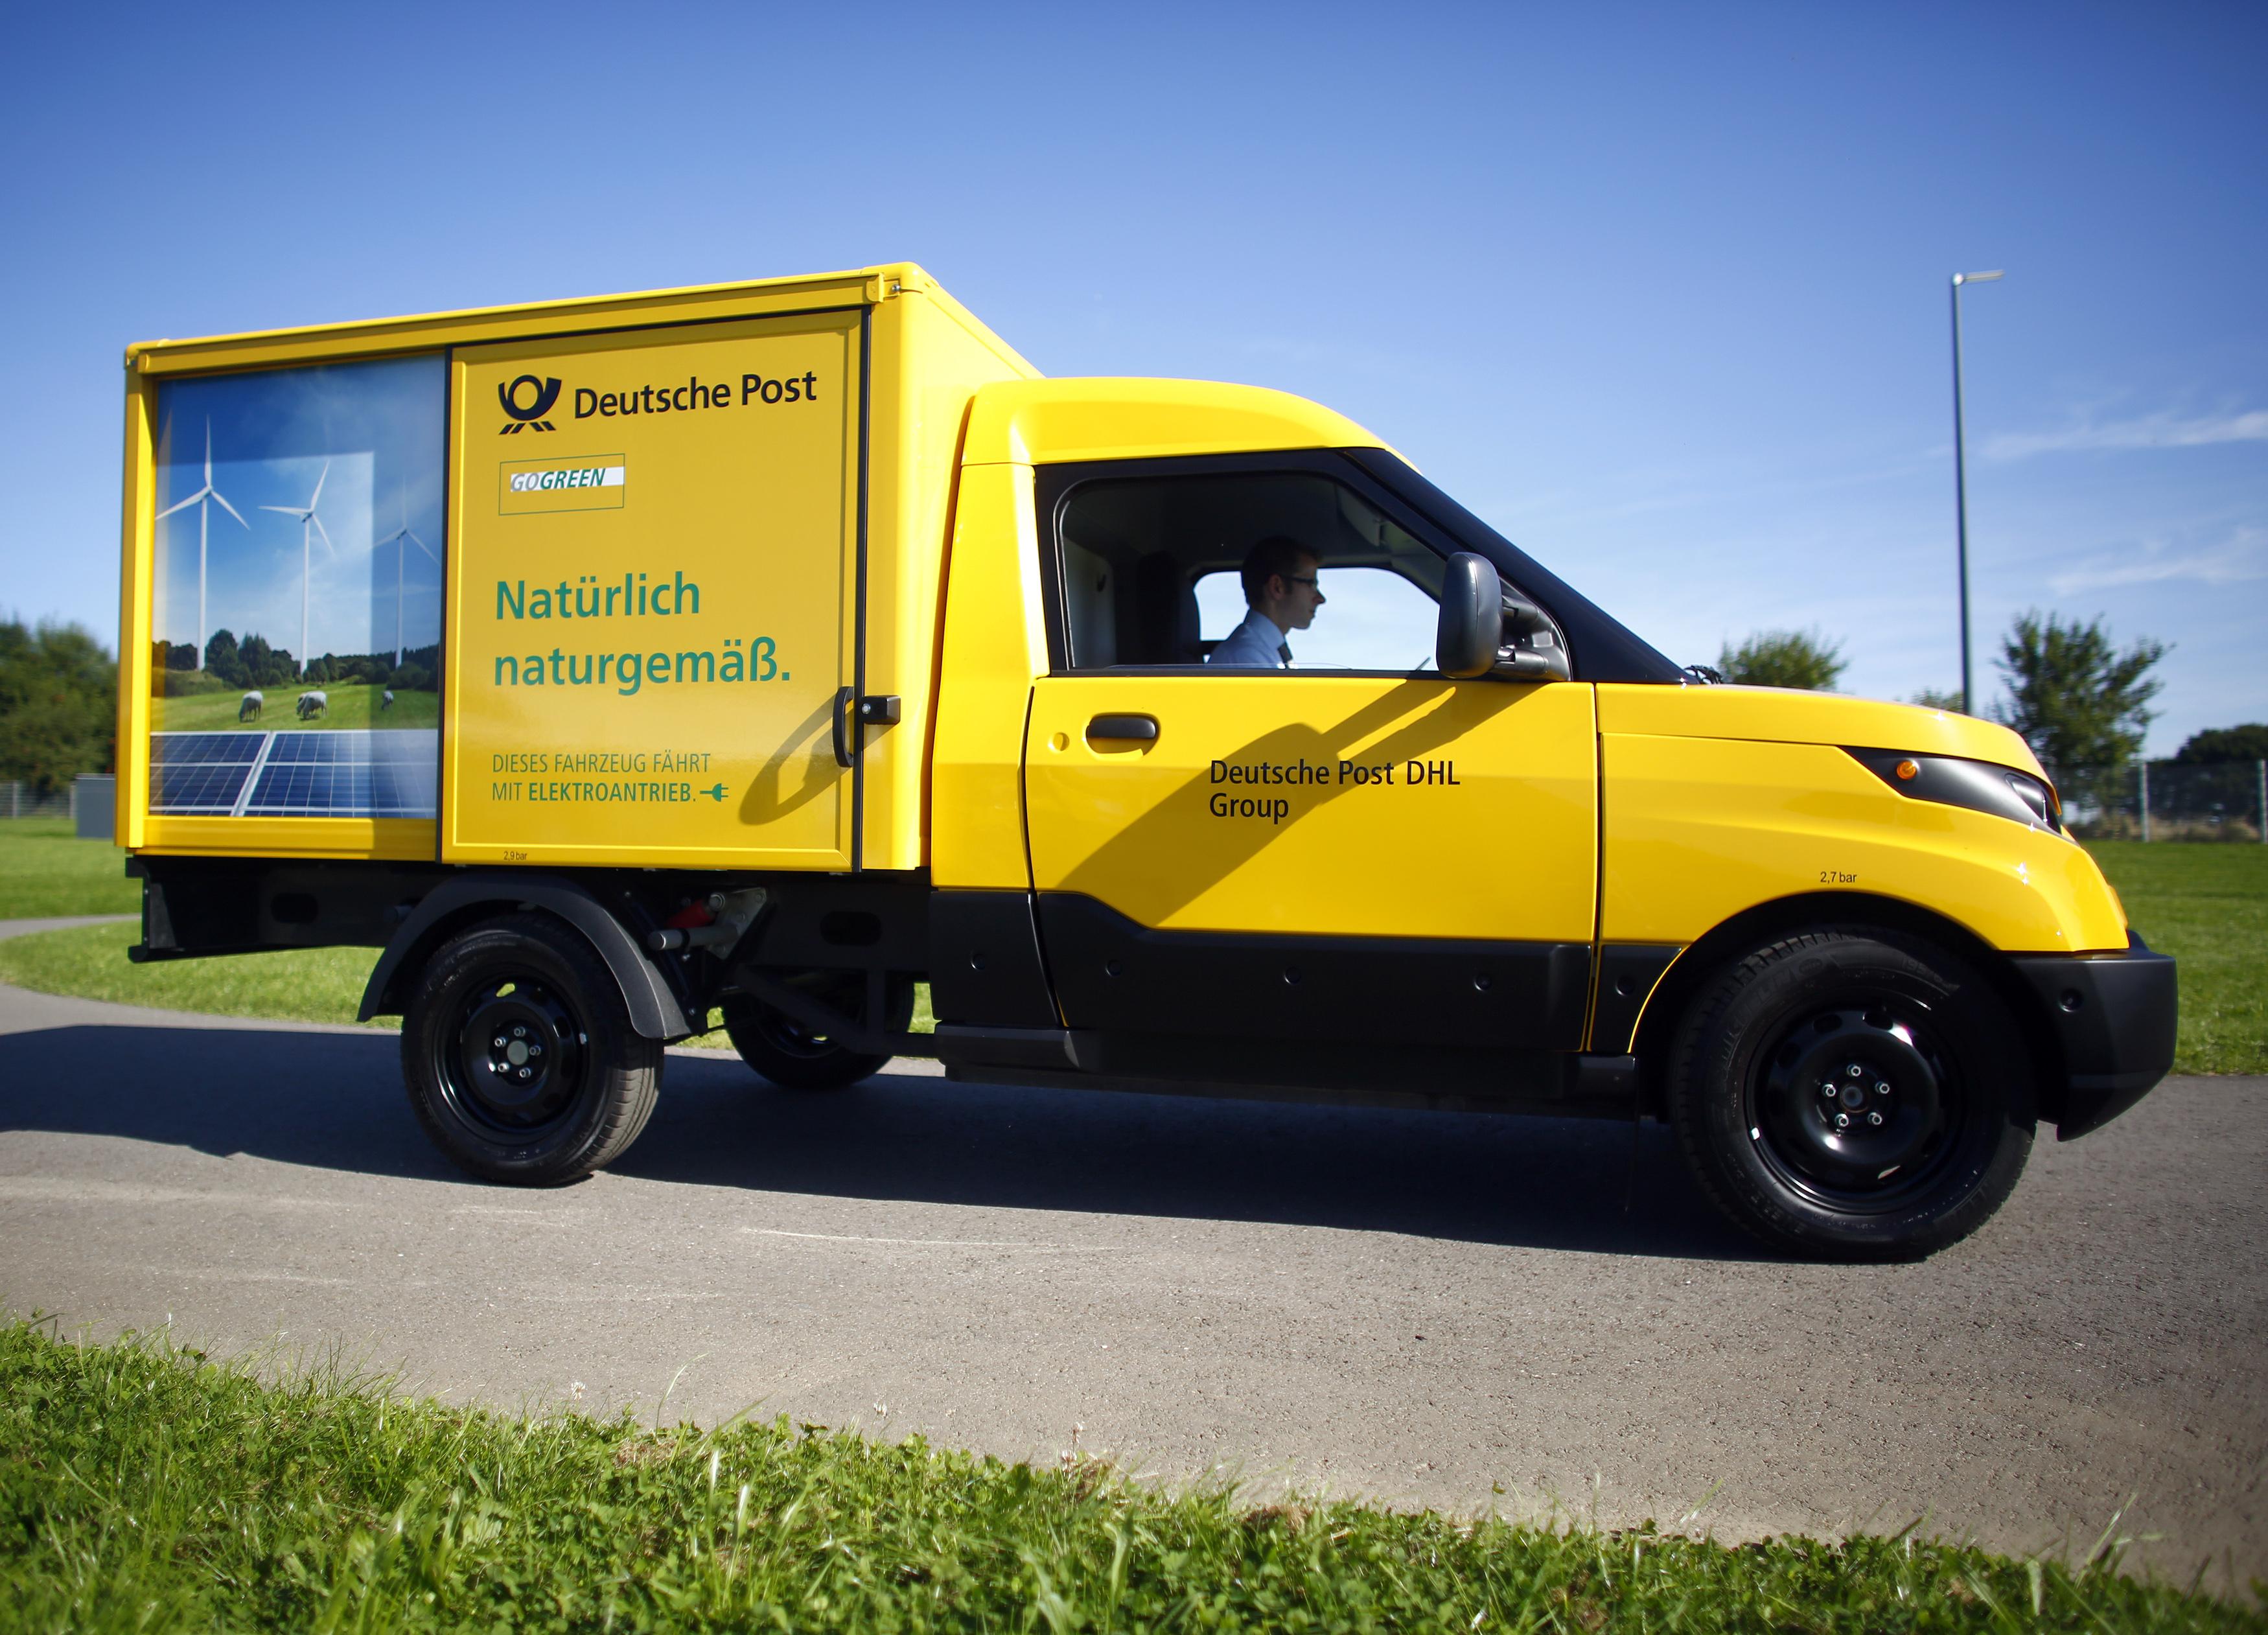 Deutsche Post has built its own electric trucks — Quartz